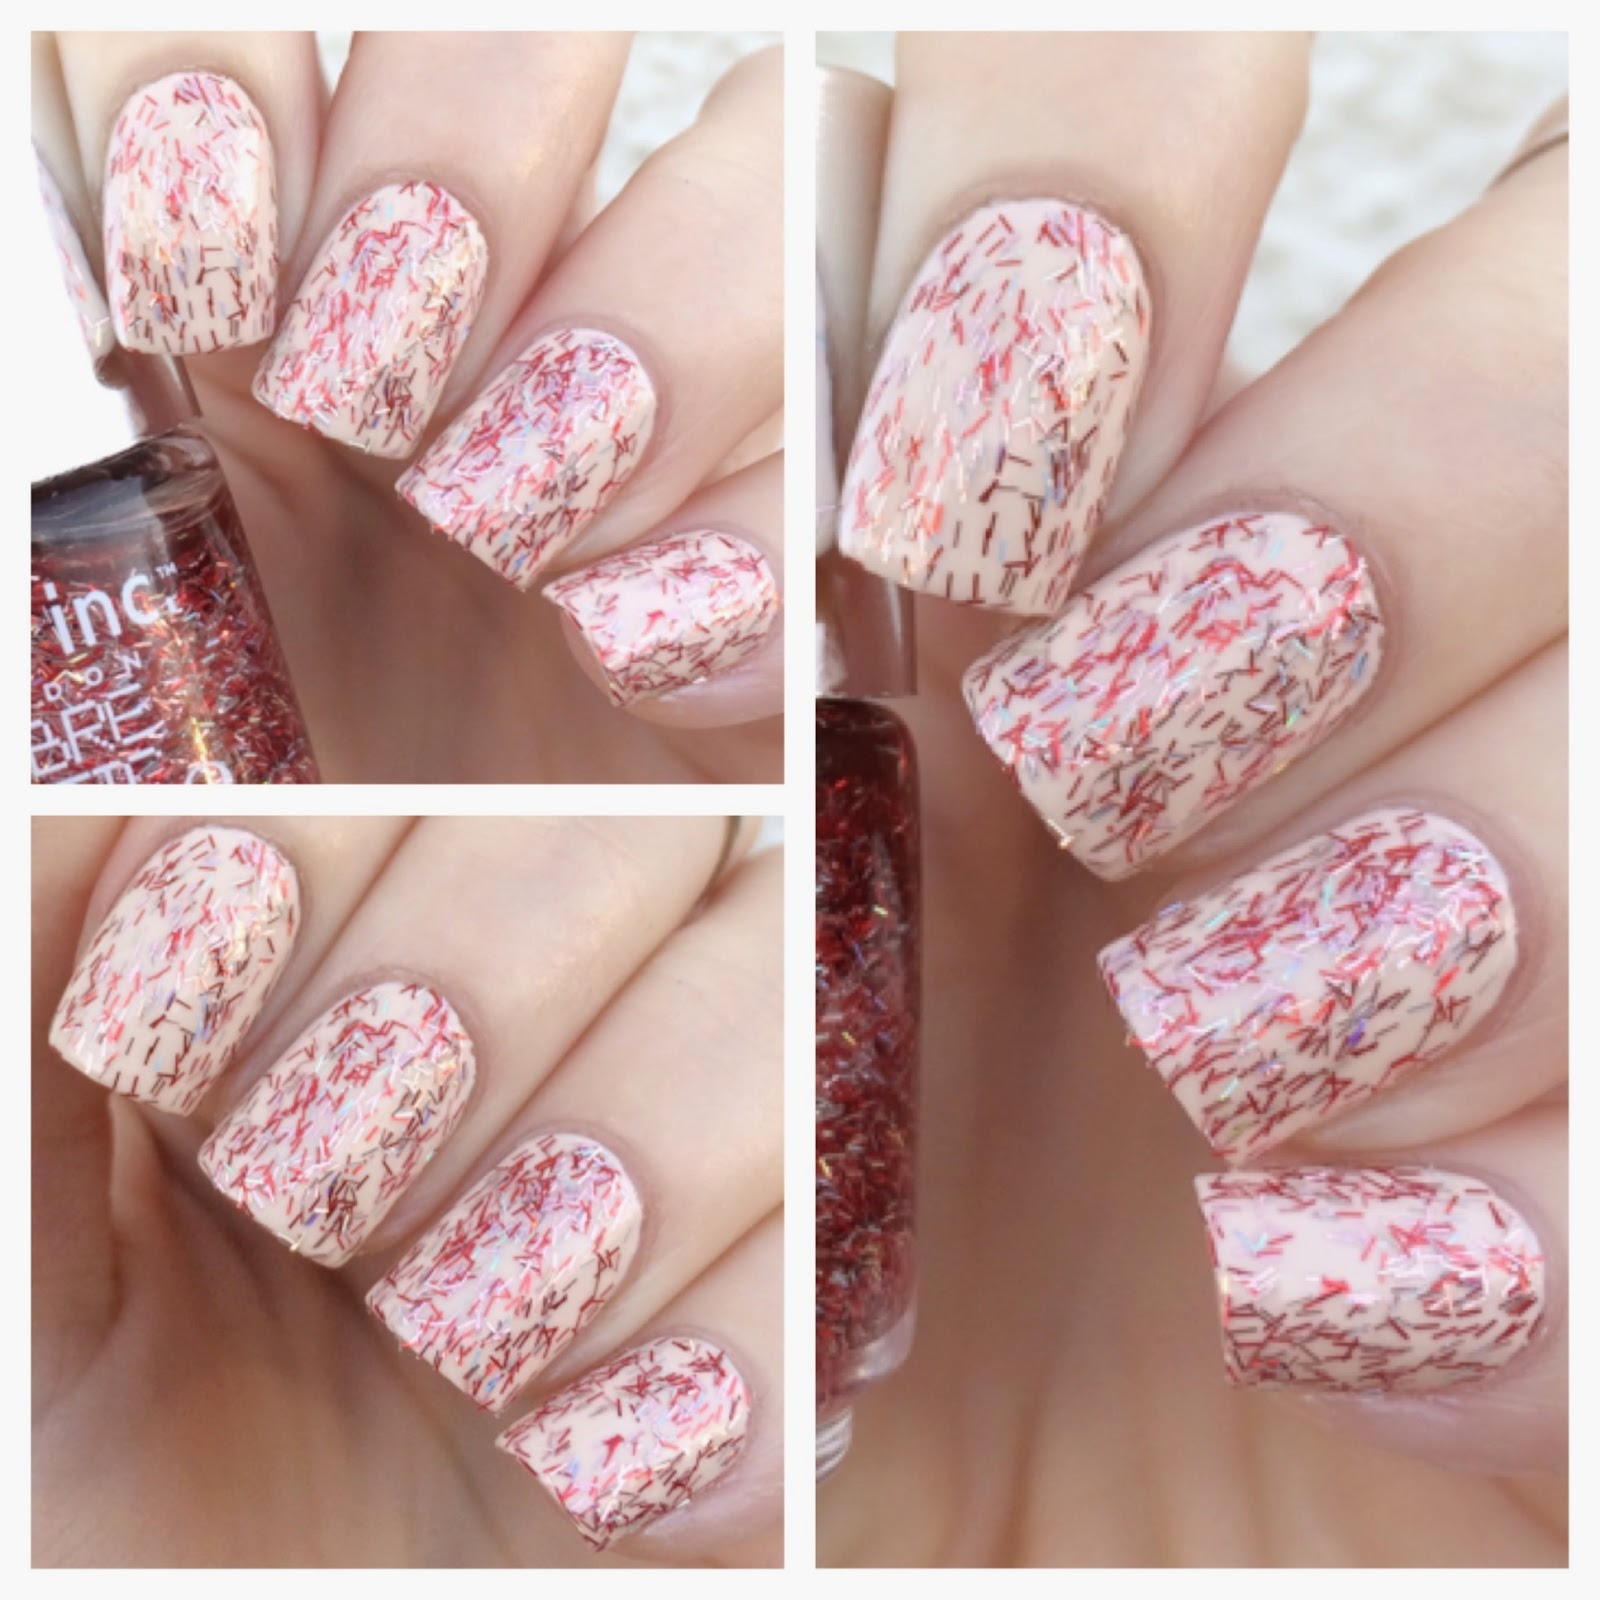 Notd Nails Inc